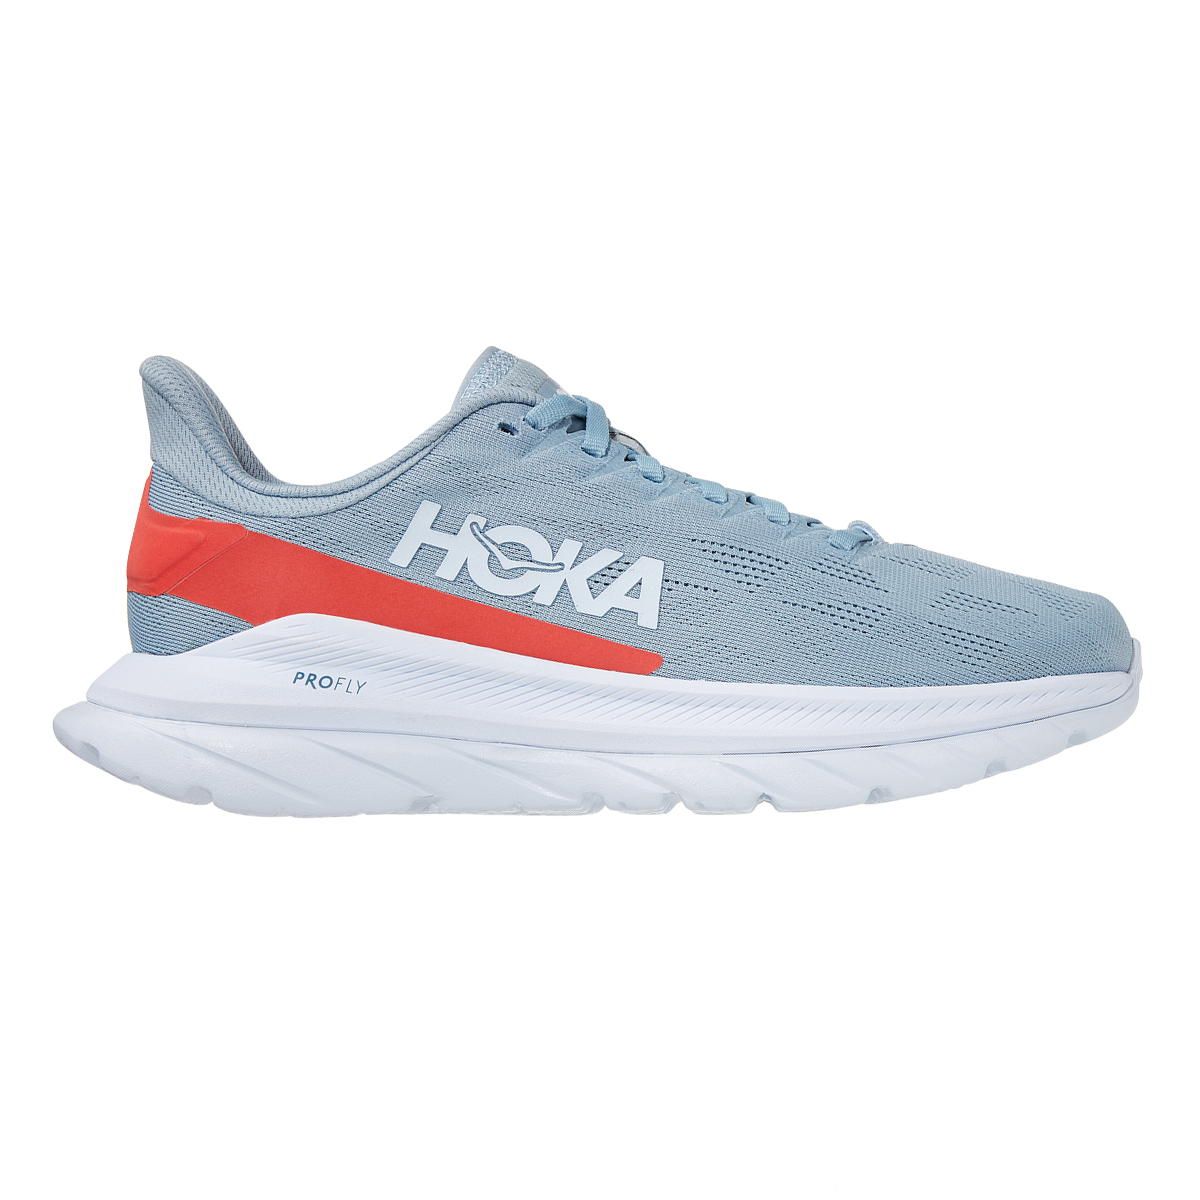 Women's Hoka One One Mach 4 Running Shoe - Color: Blue Fog/Hot Coral - Size: 5 - Width: Regular, Blue Fog/Hot Coral, large, image 1